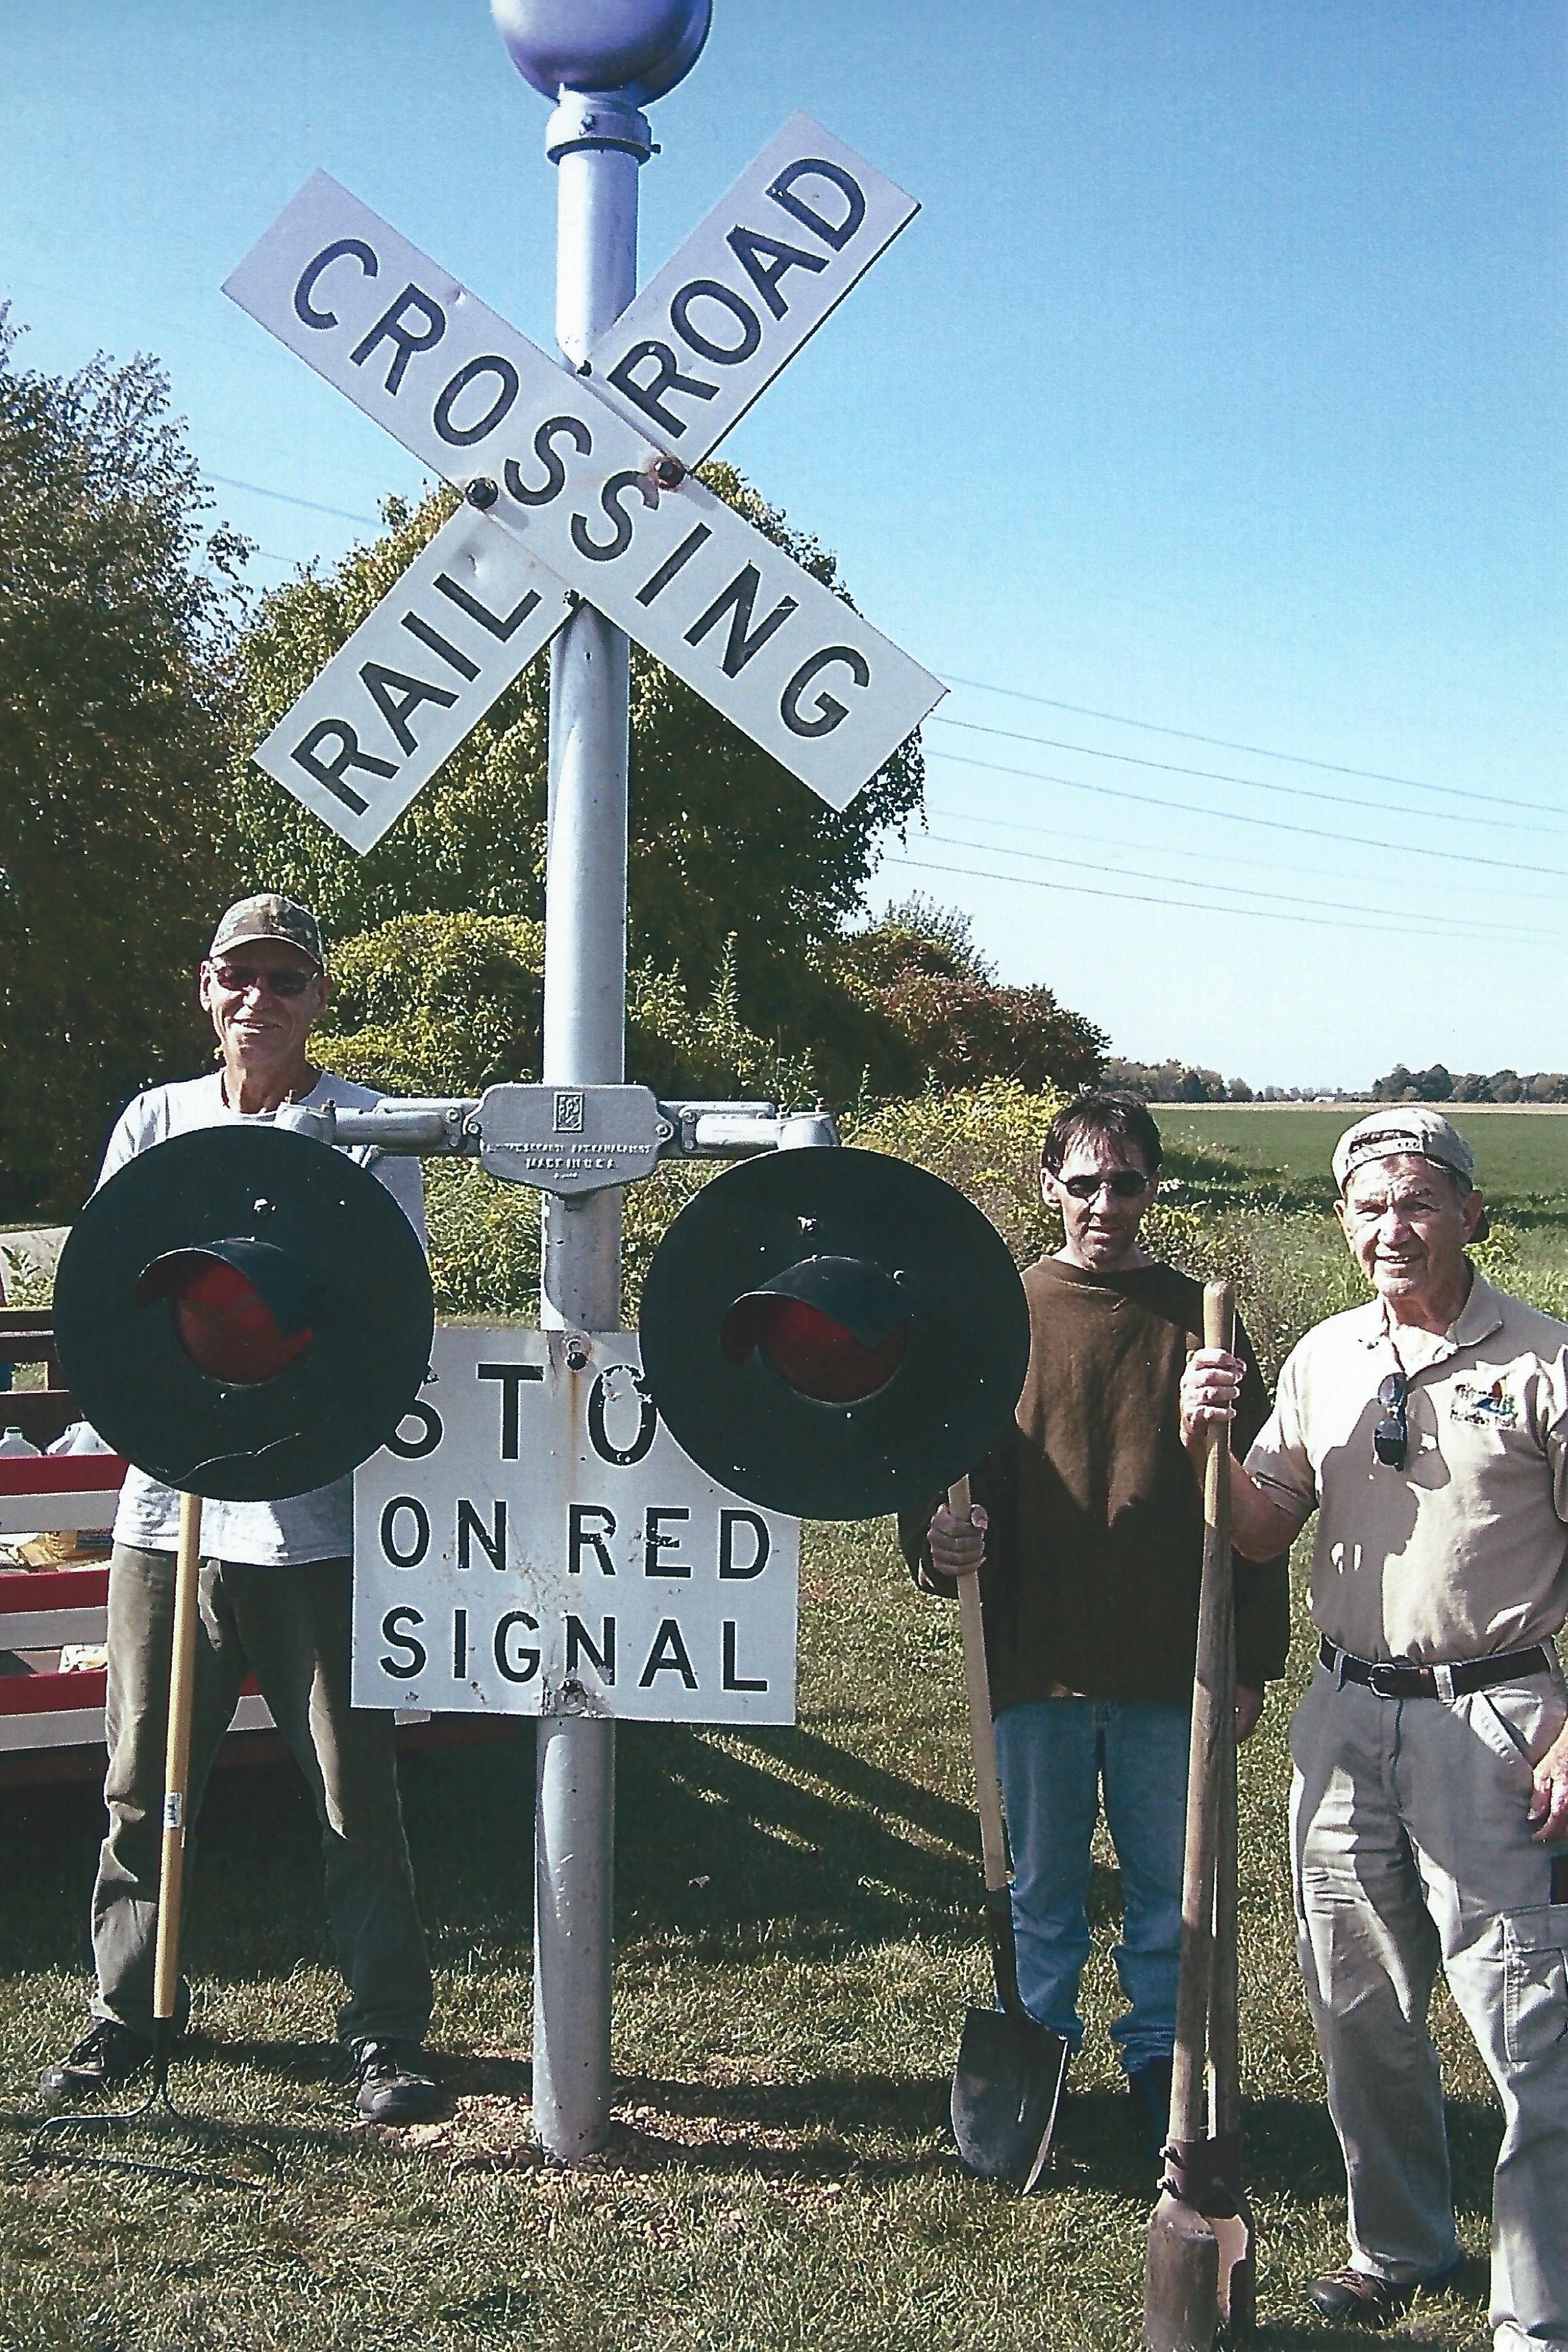 3. Marne RR Crossing Signage